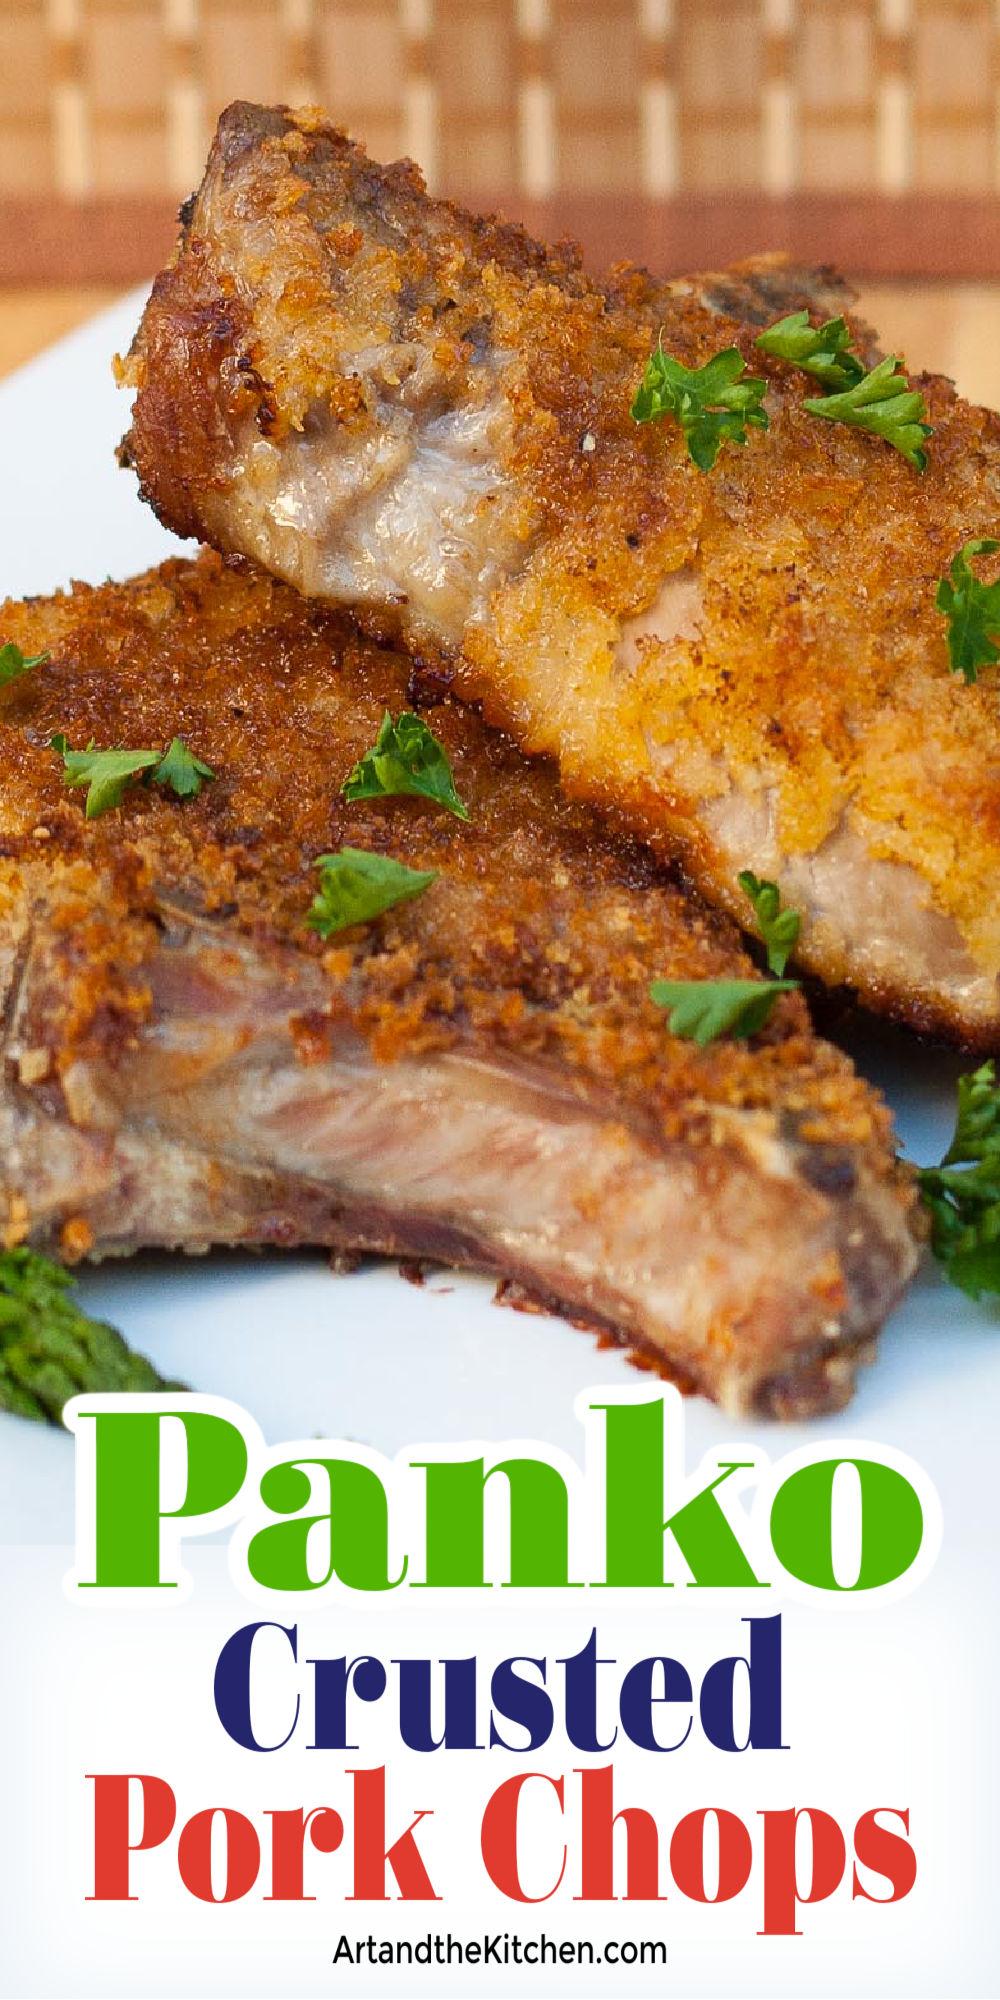 Panko breaded pork chops make pork chops that are crispy on the outside, tender and juicy on the inside! via @artandthekitch